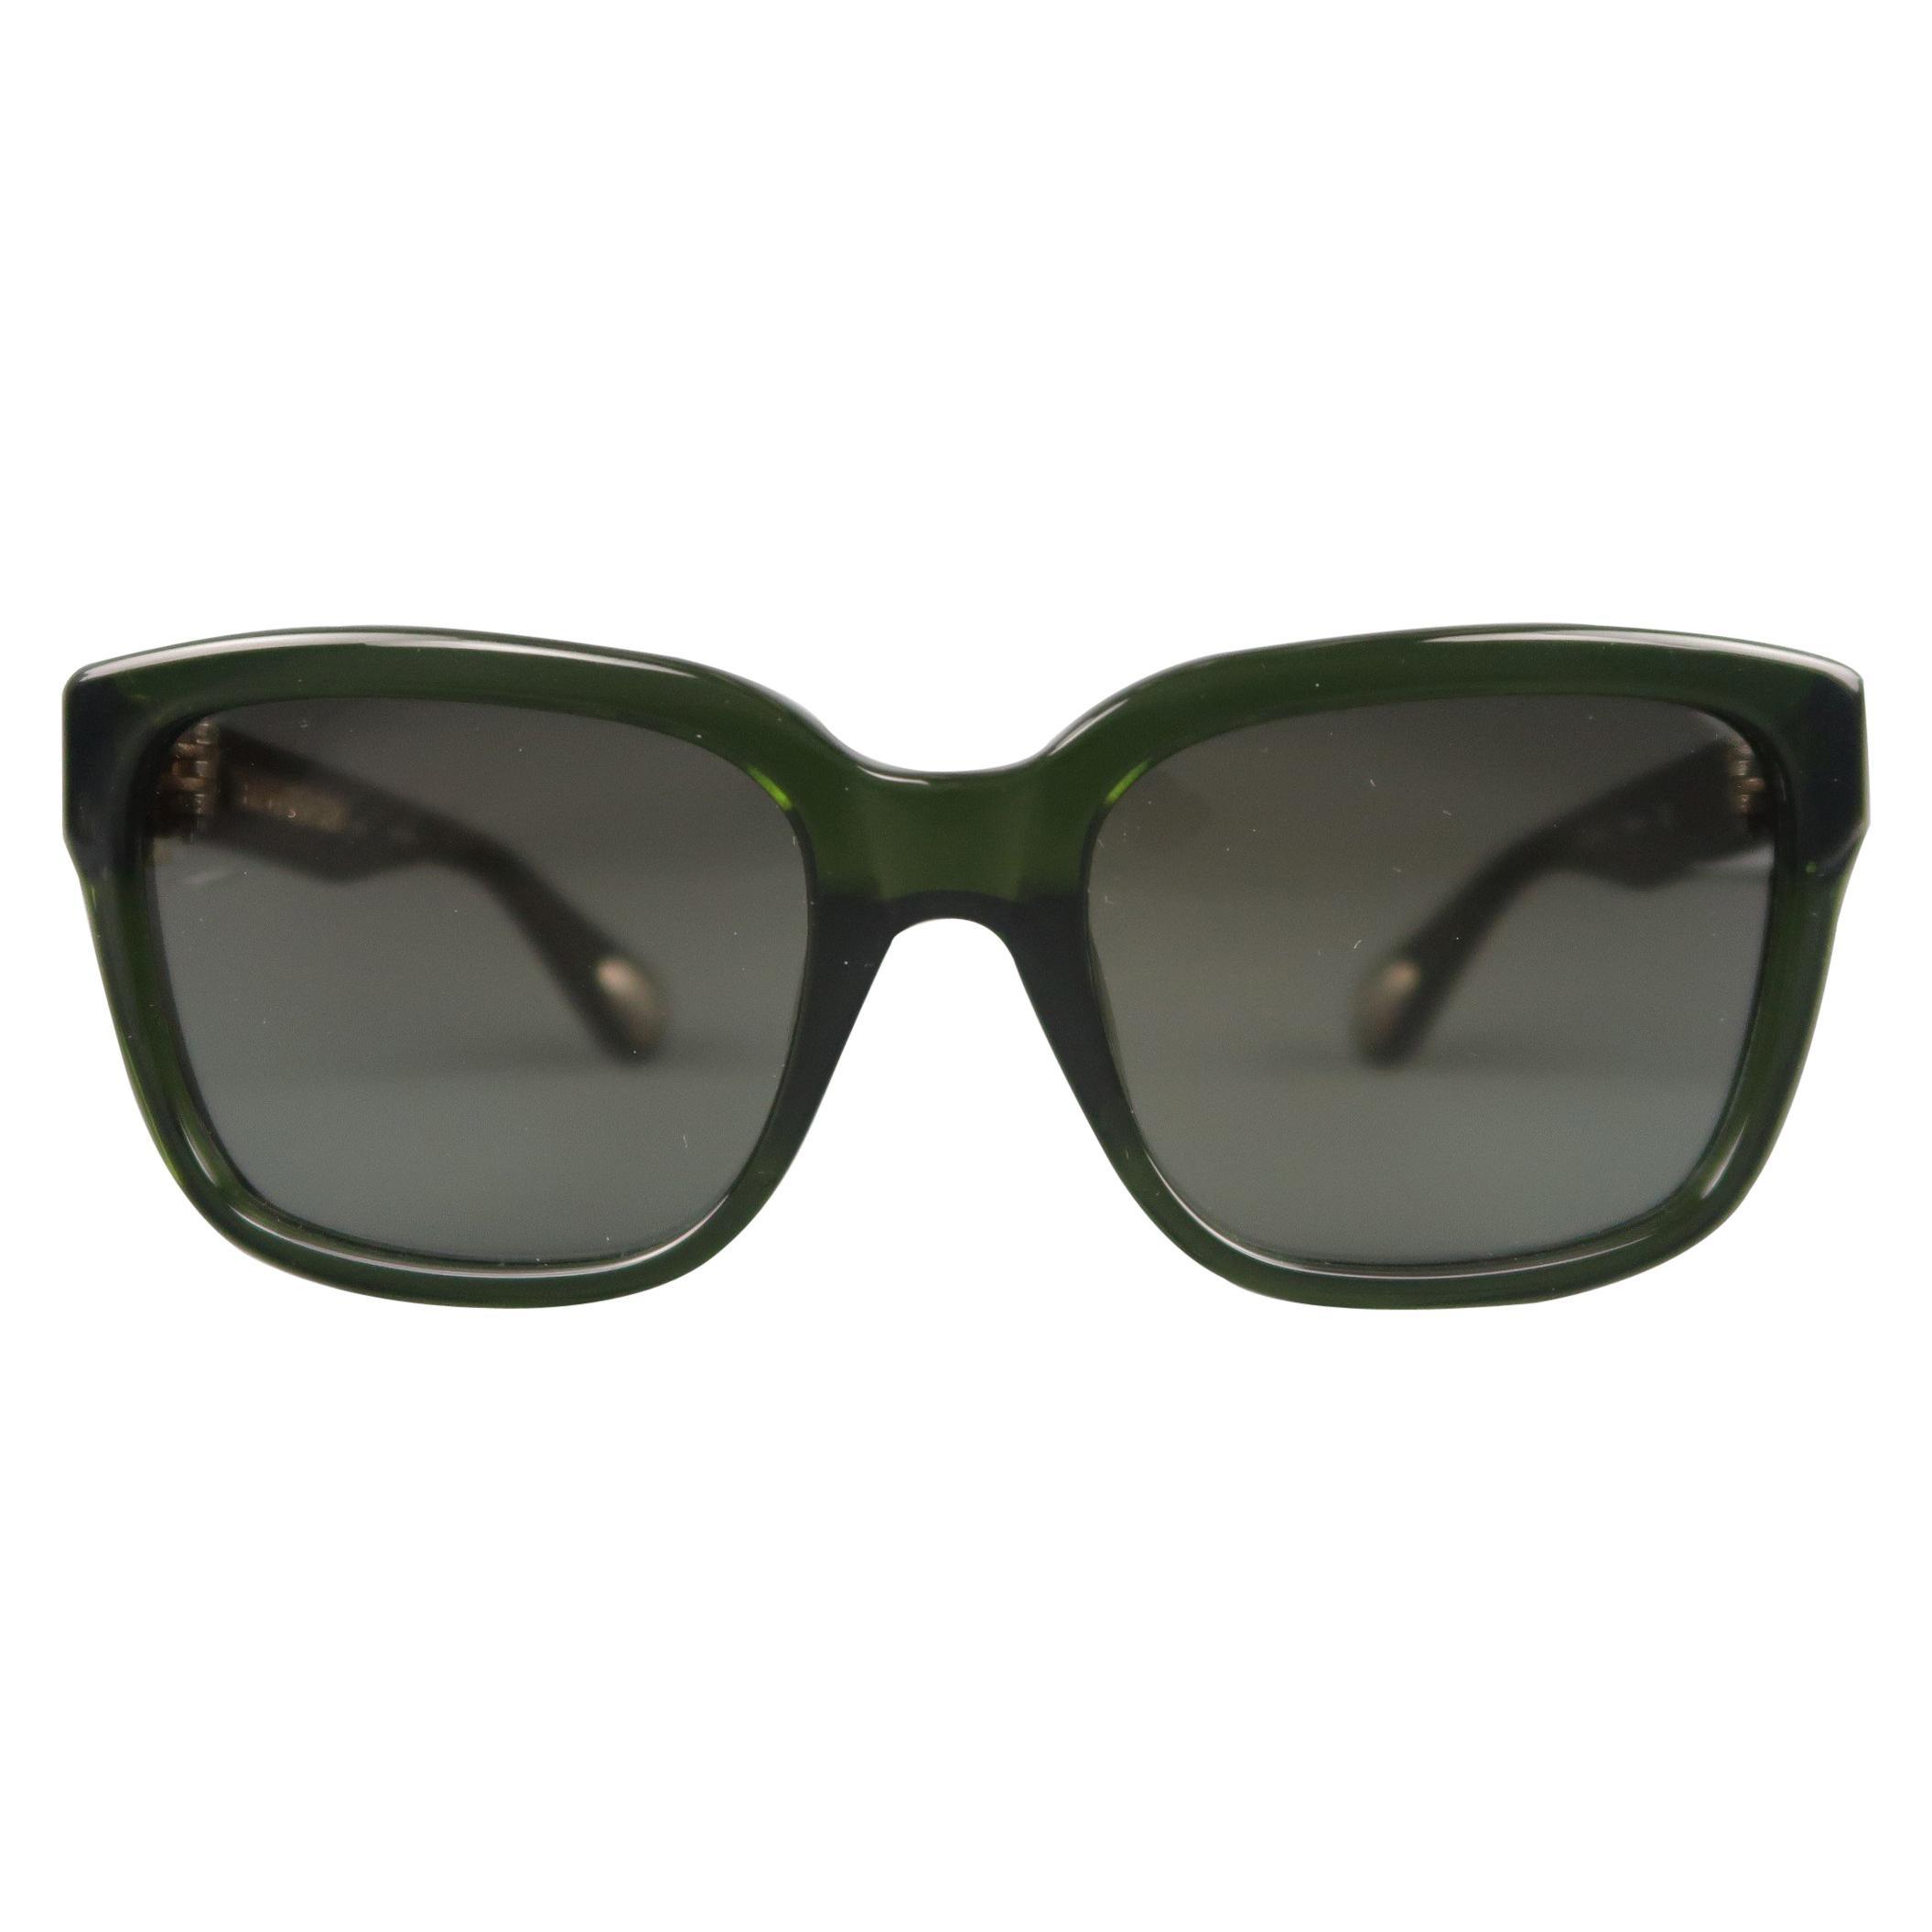 5b8b93e6e1 PRADA Black Acetate Oversized Square Frame Sunglasses at 1stdibs